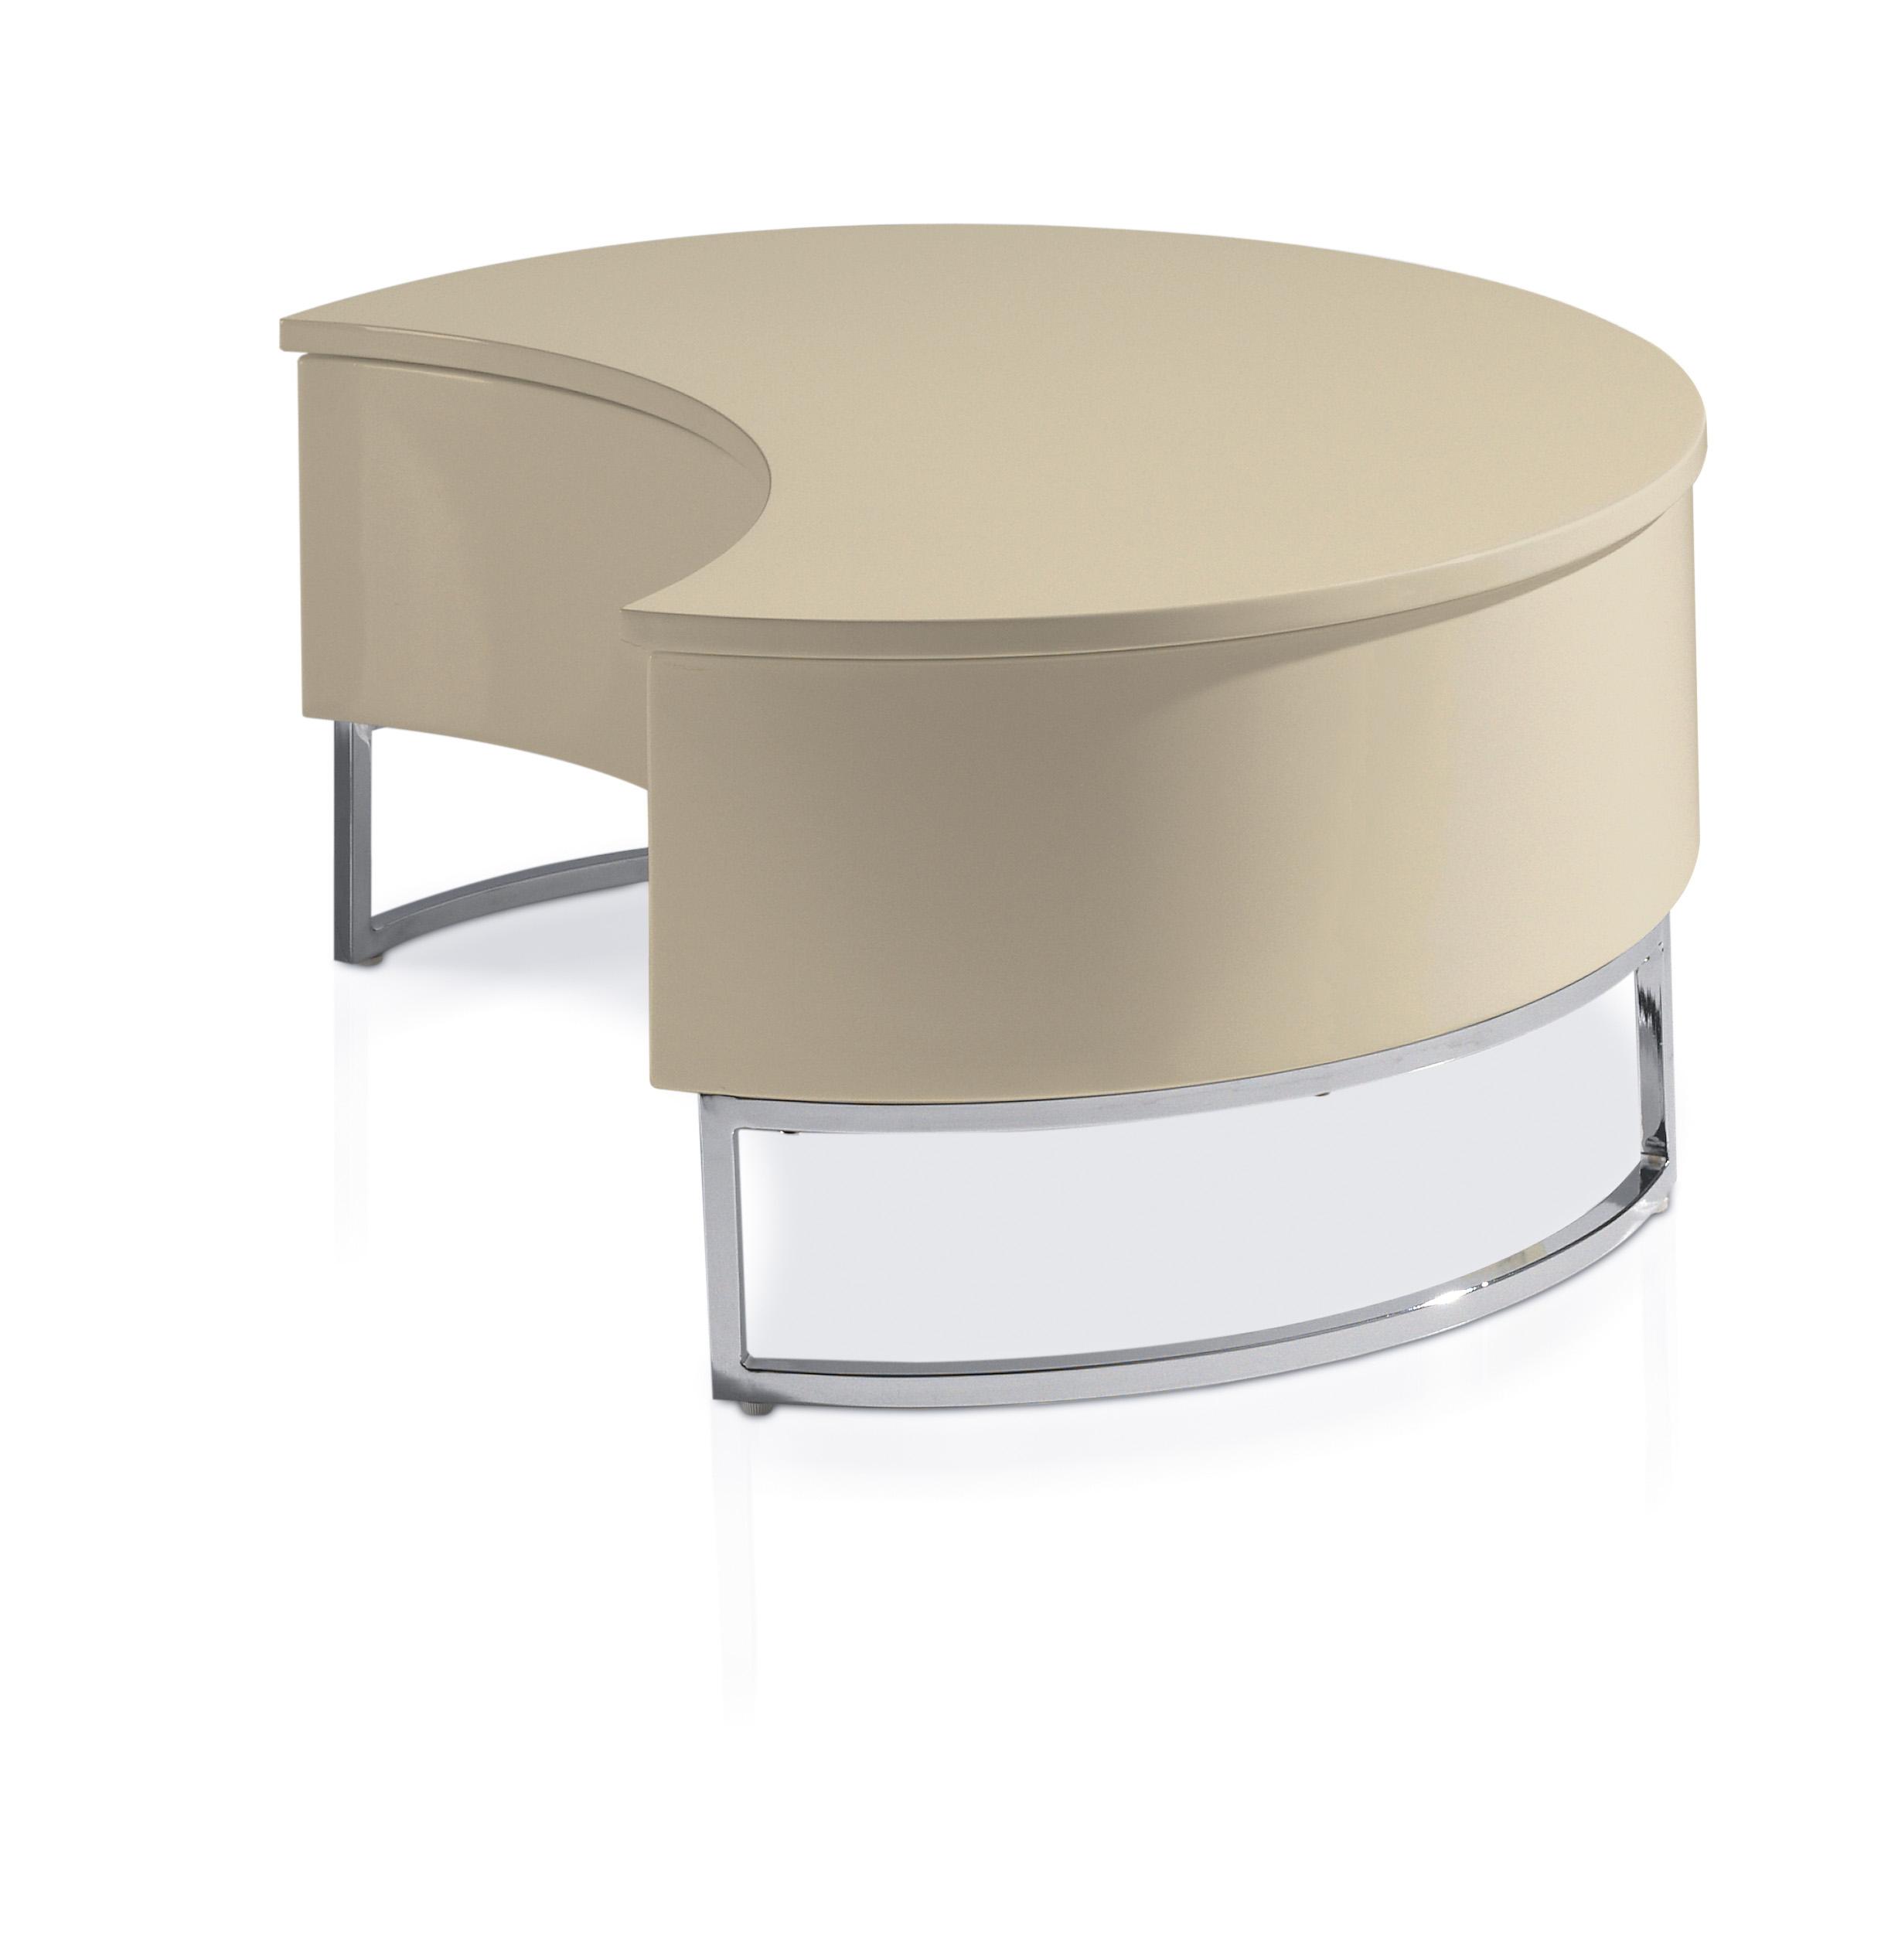 table basse laqu e recevable cr me pied acier chrom luna. Black Bedroom Furniture Sets. Home Design Ideas